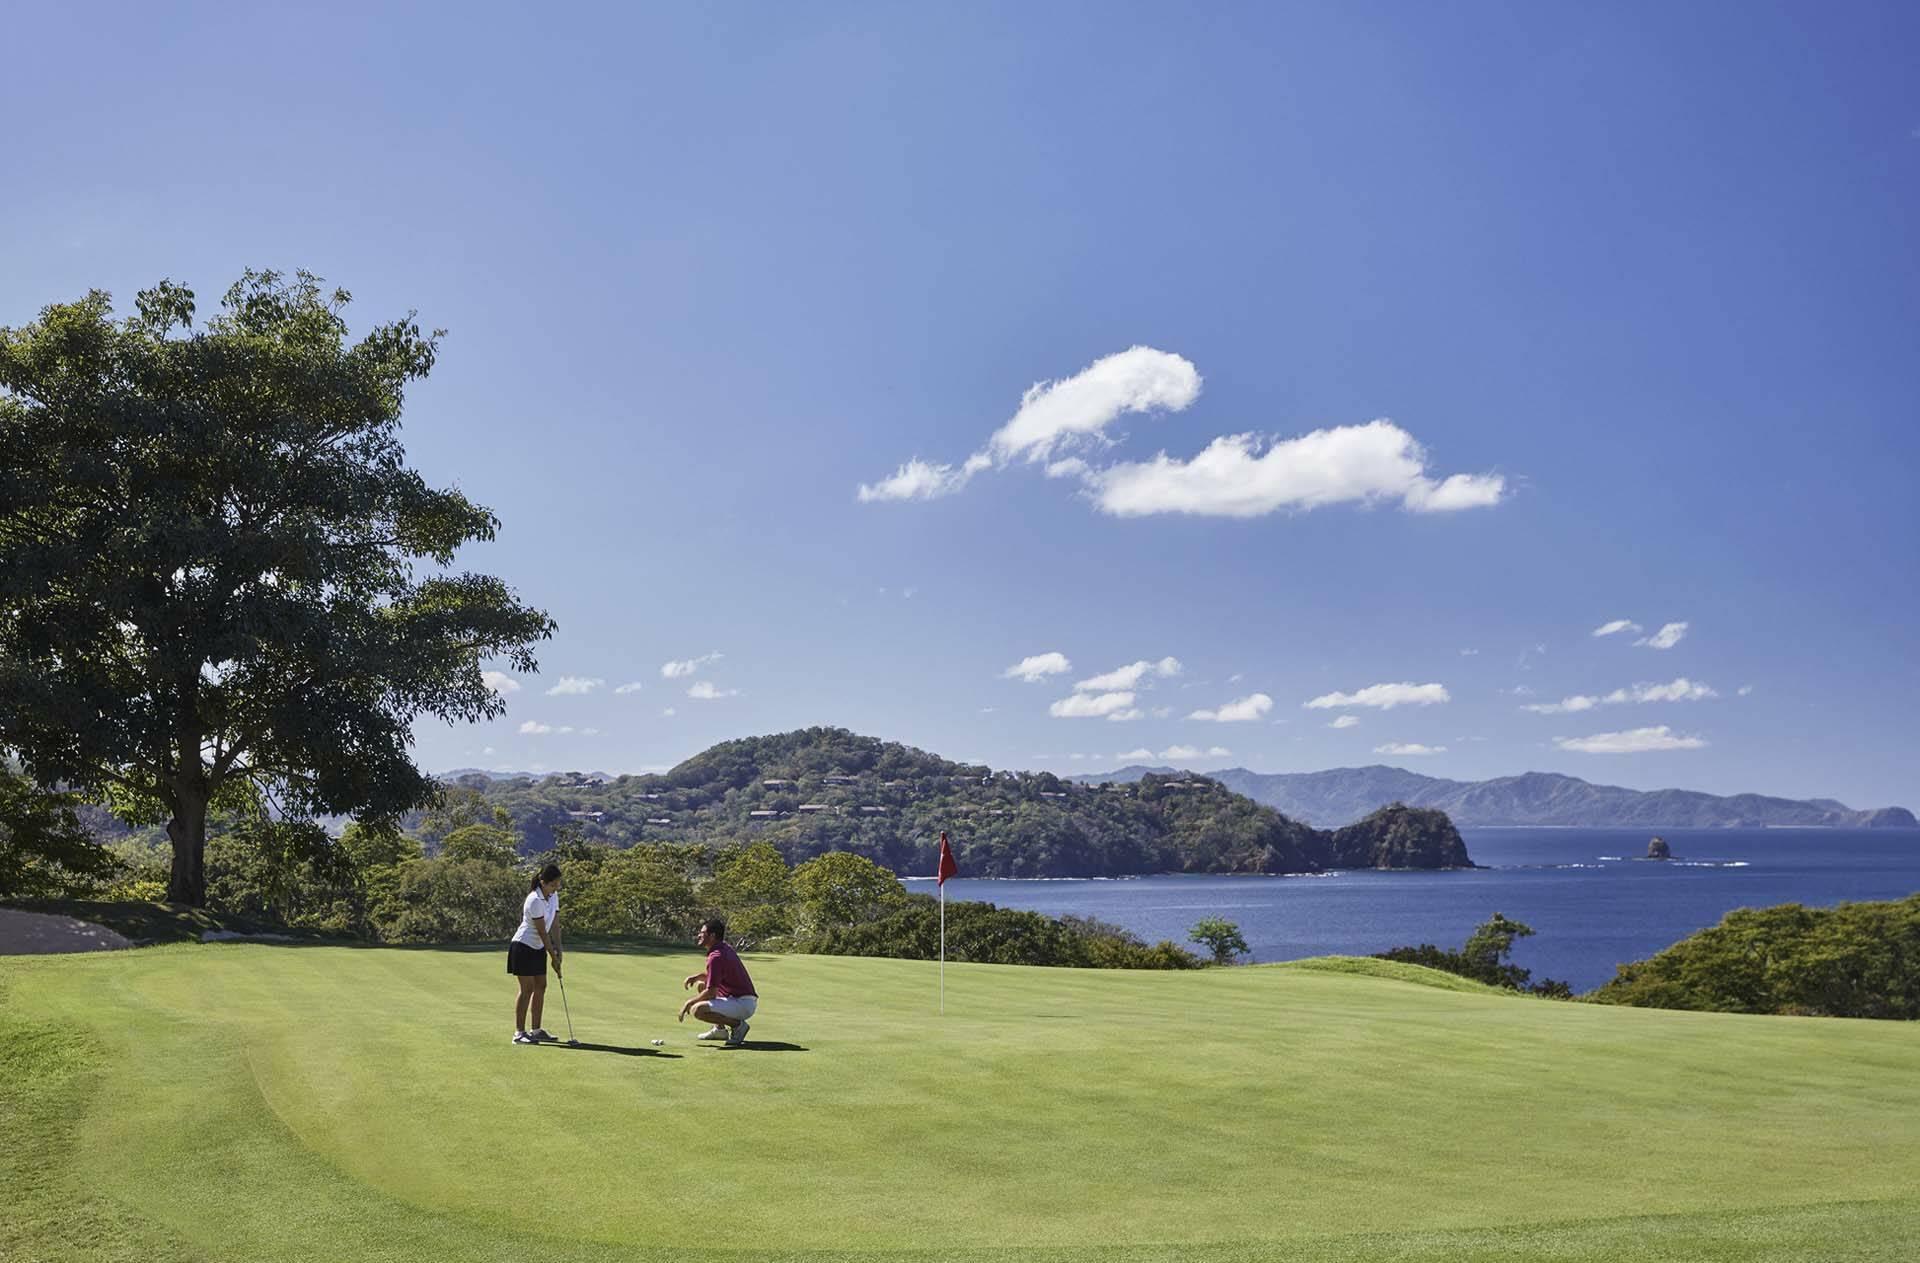 Costa Rica Four Seasons Papagayo golf